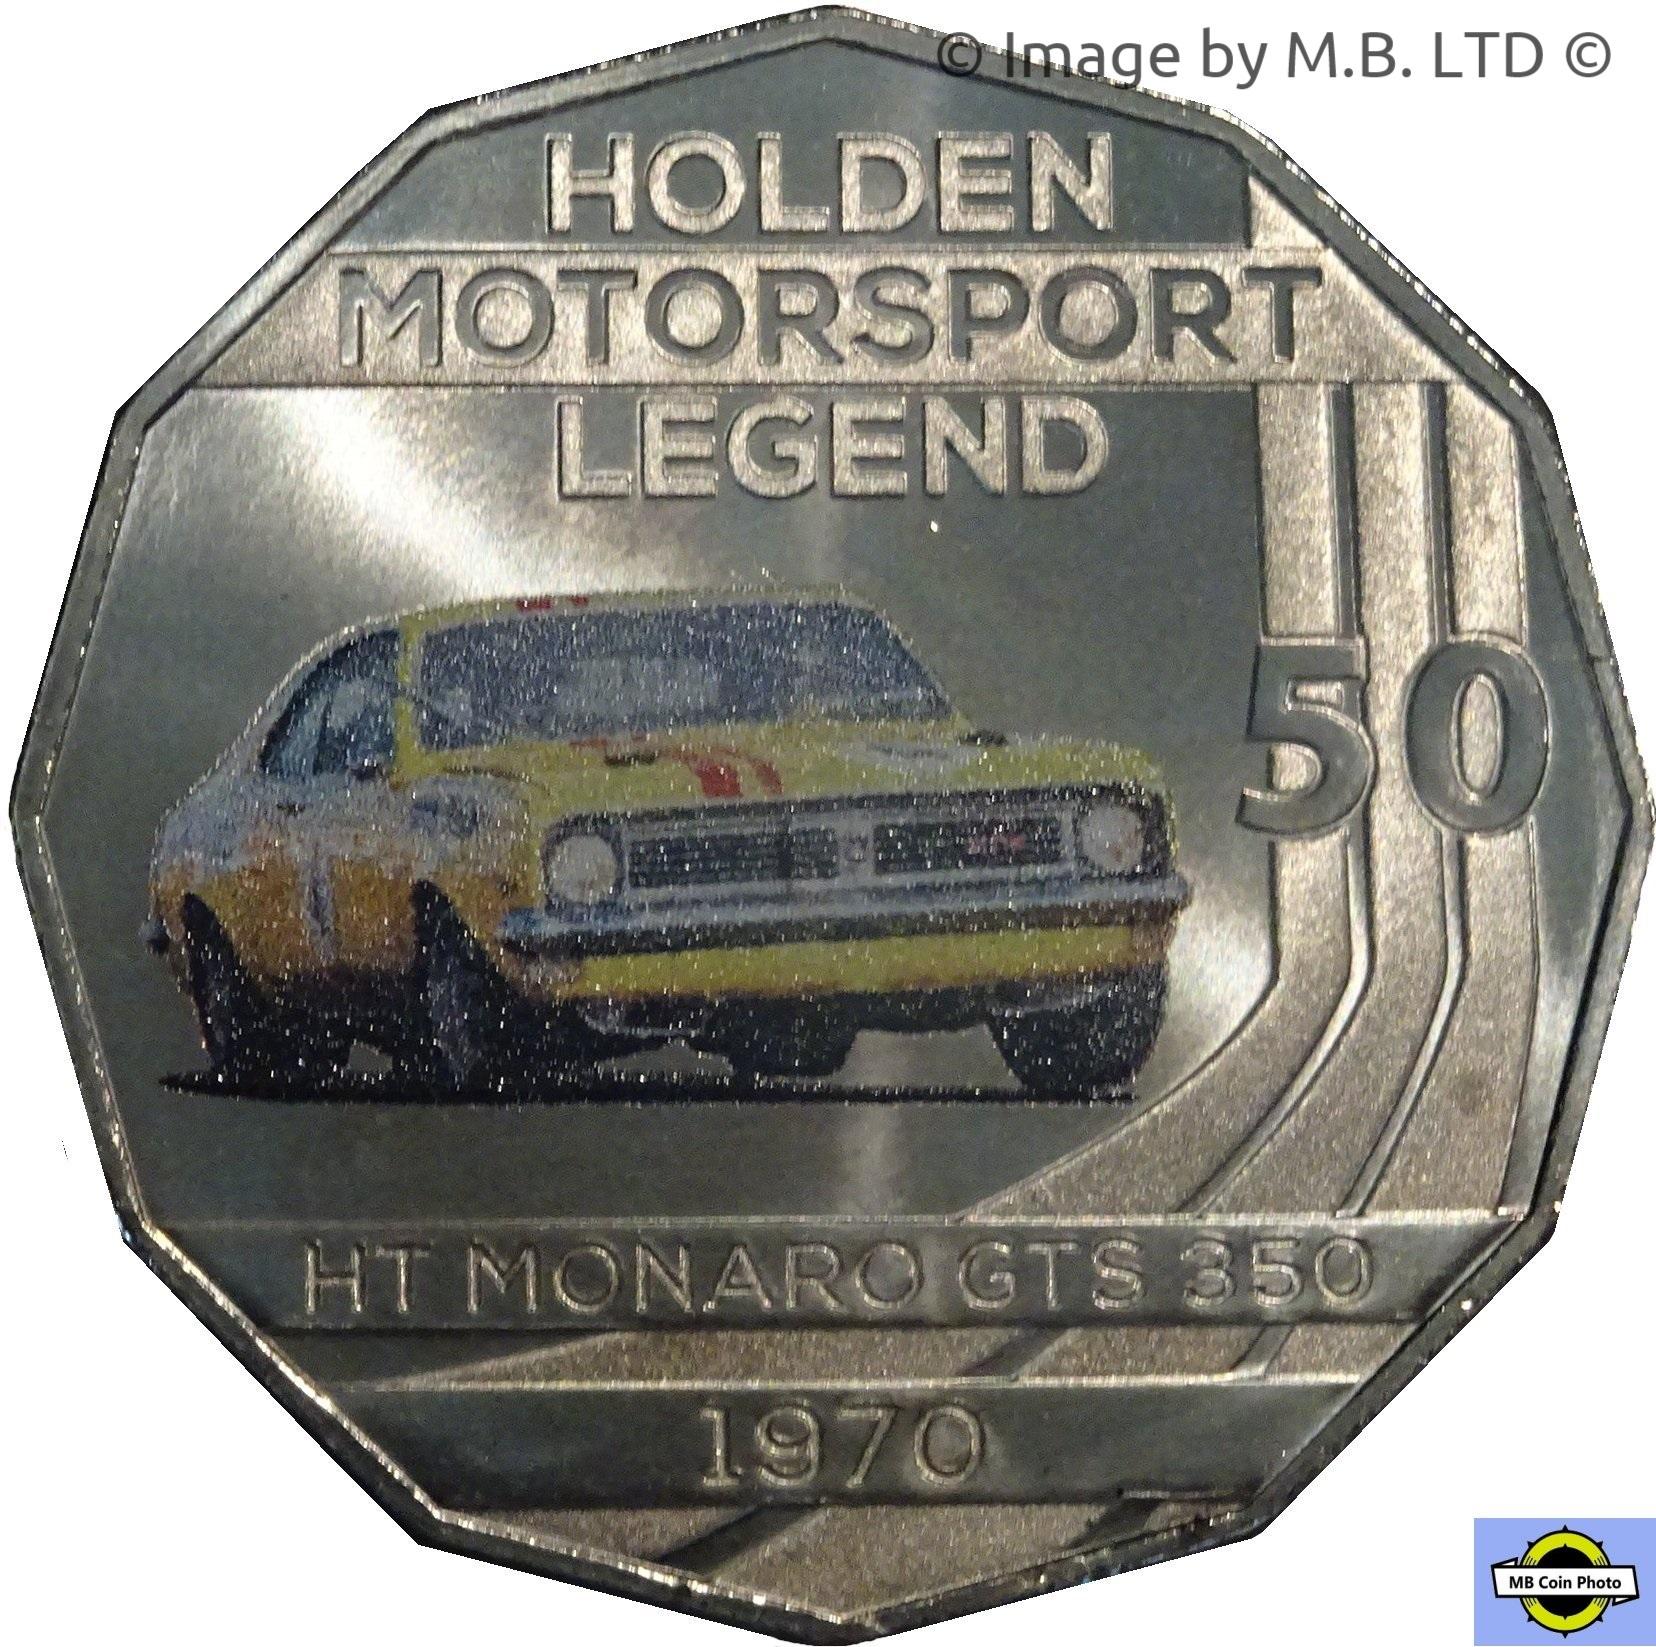 2018 Holden Motorsport RAM Coloured Unc coin 1970 HT Monaro GTS 350